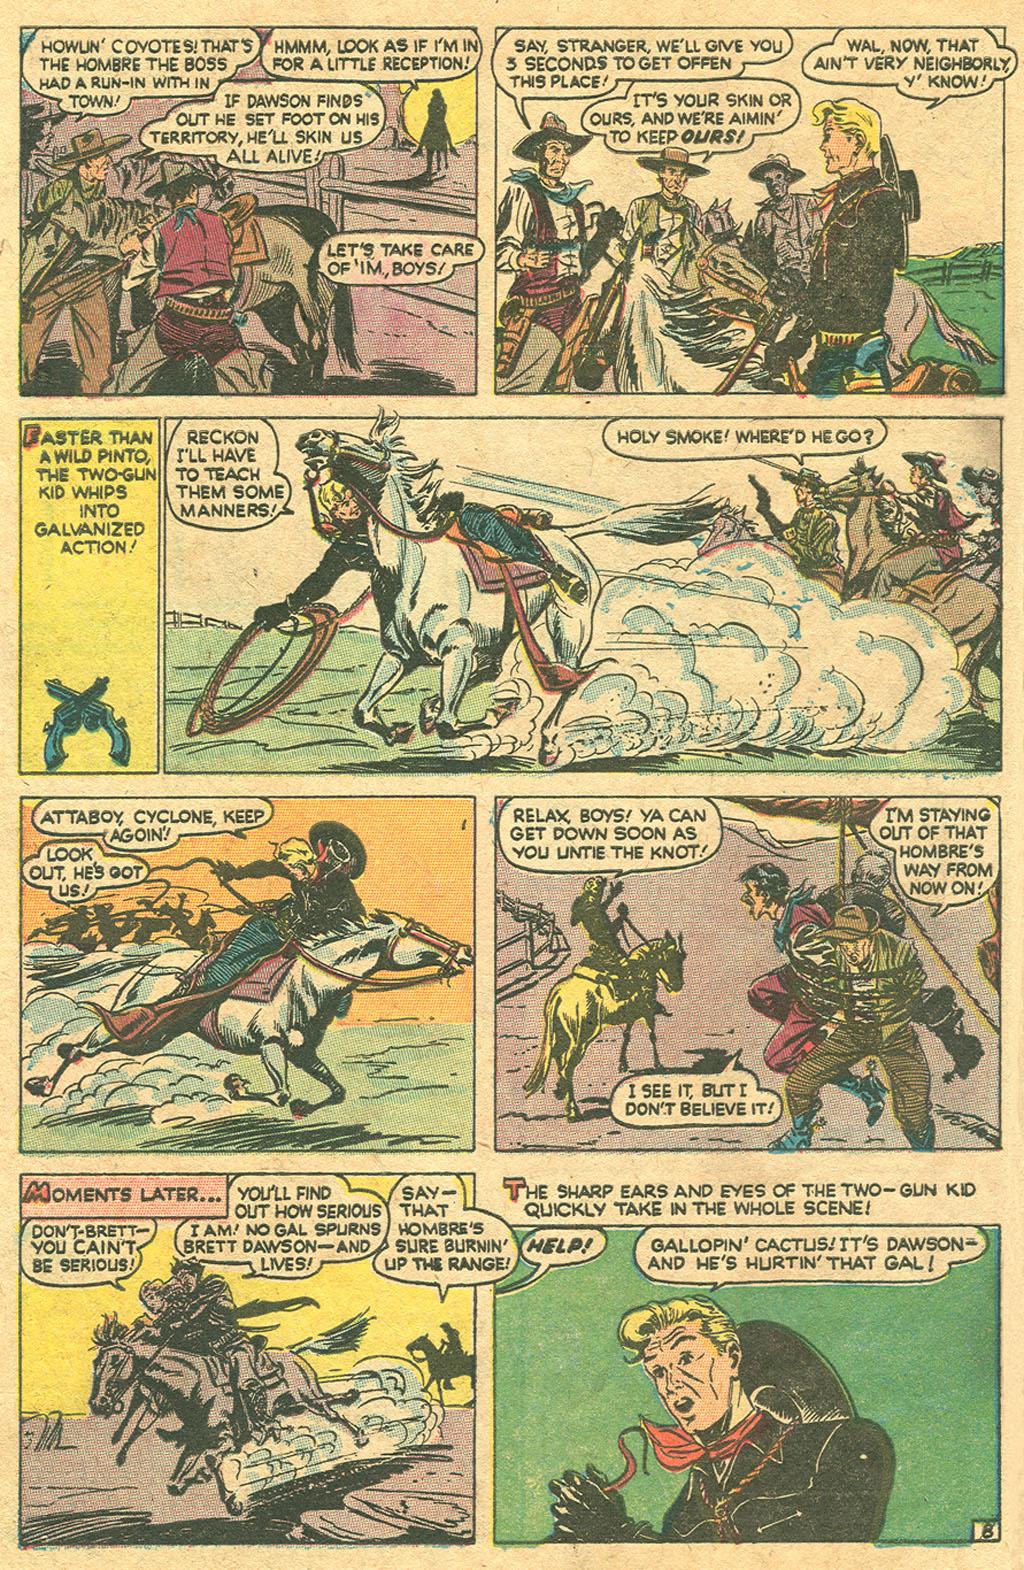 Read online Two-Gun Kid comic -  Issue #1 - 10